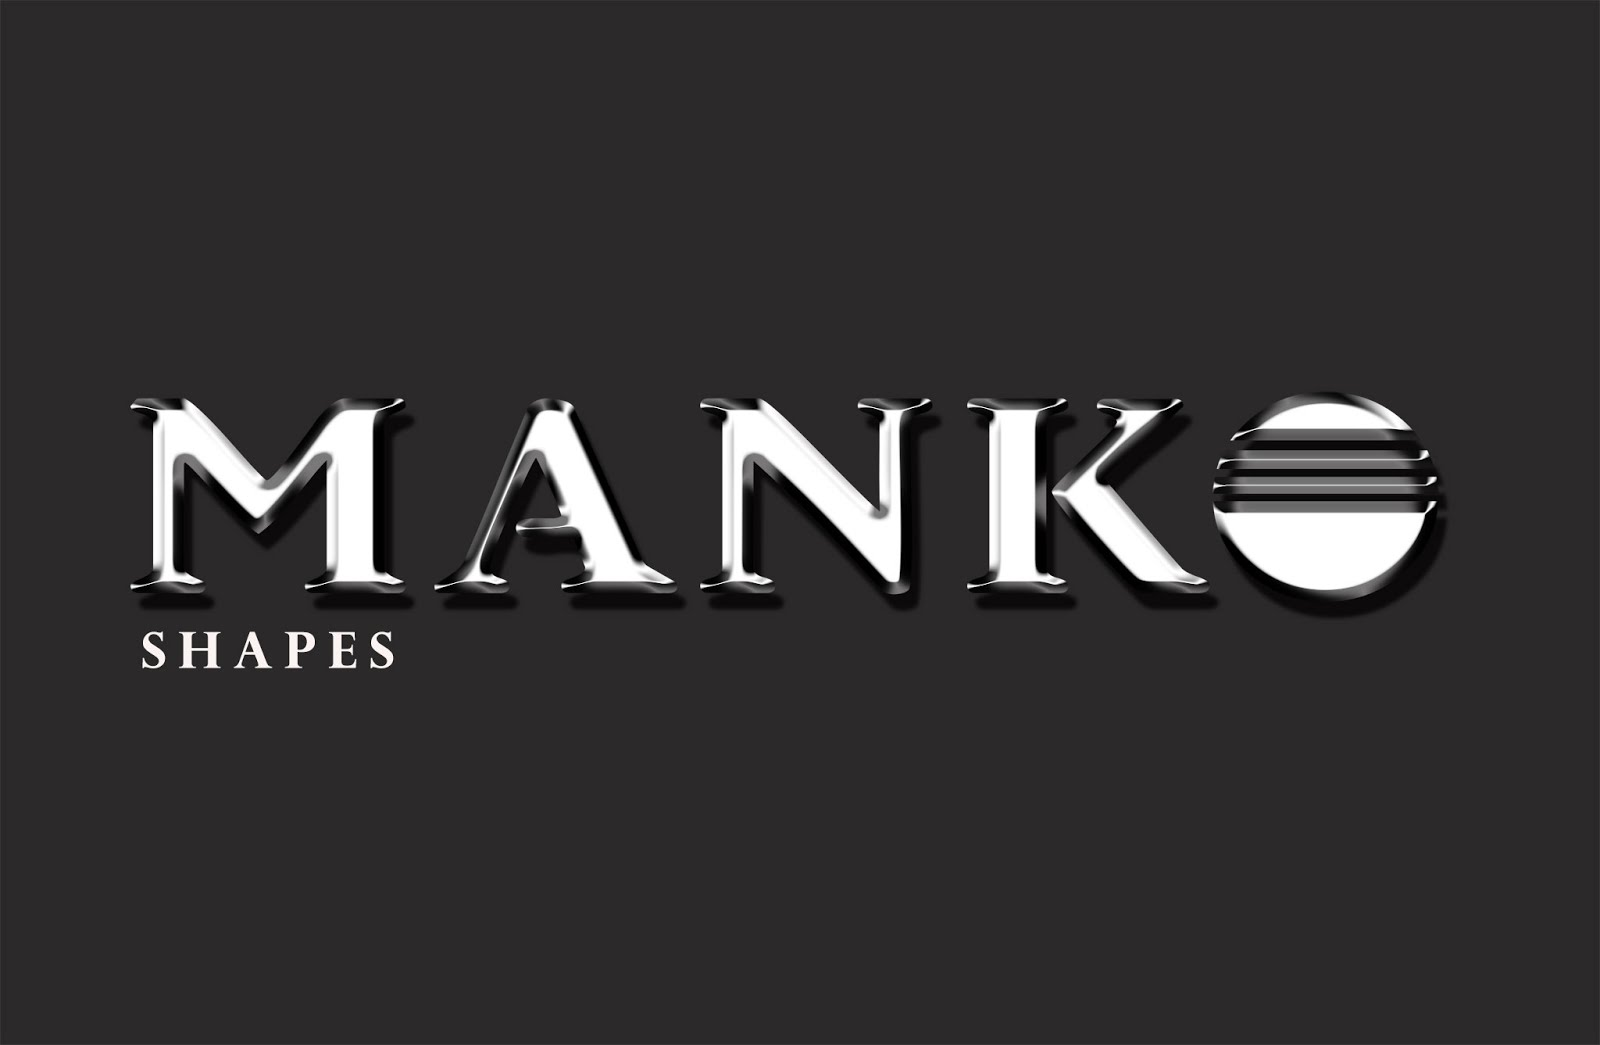 **MANKO** Shapes